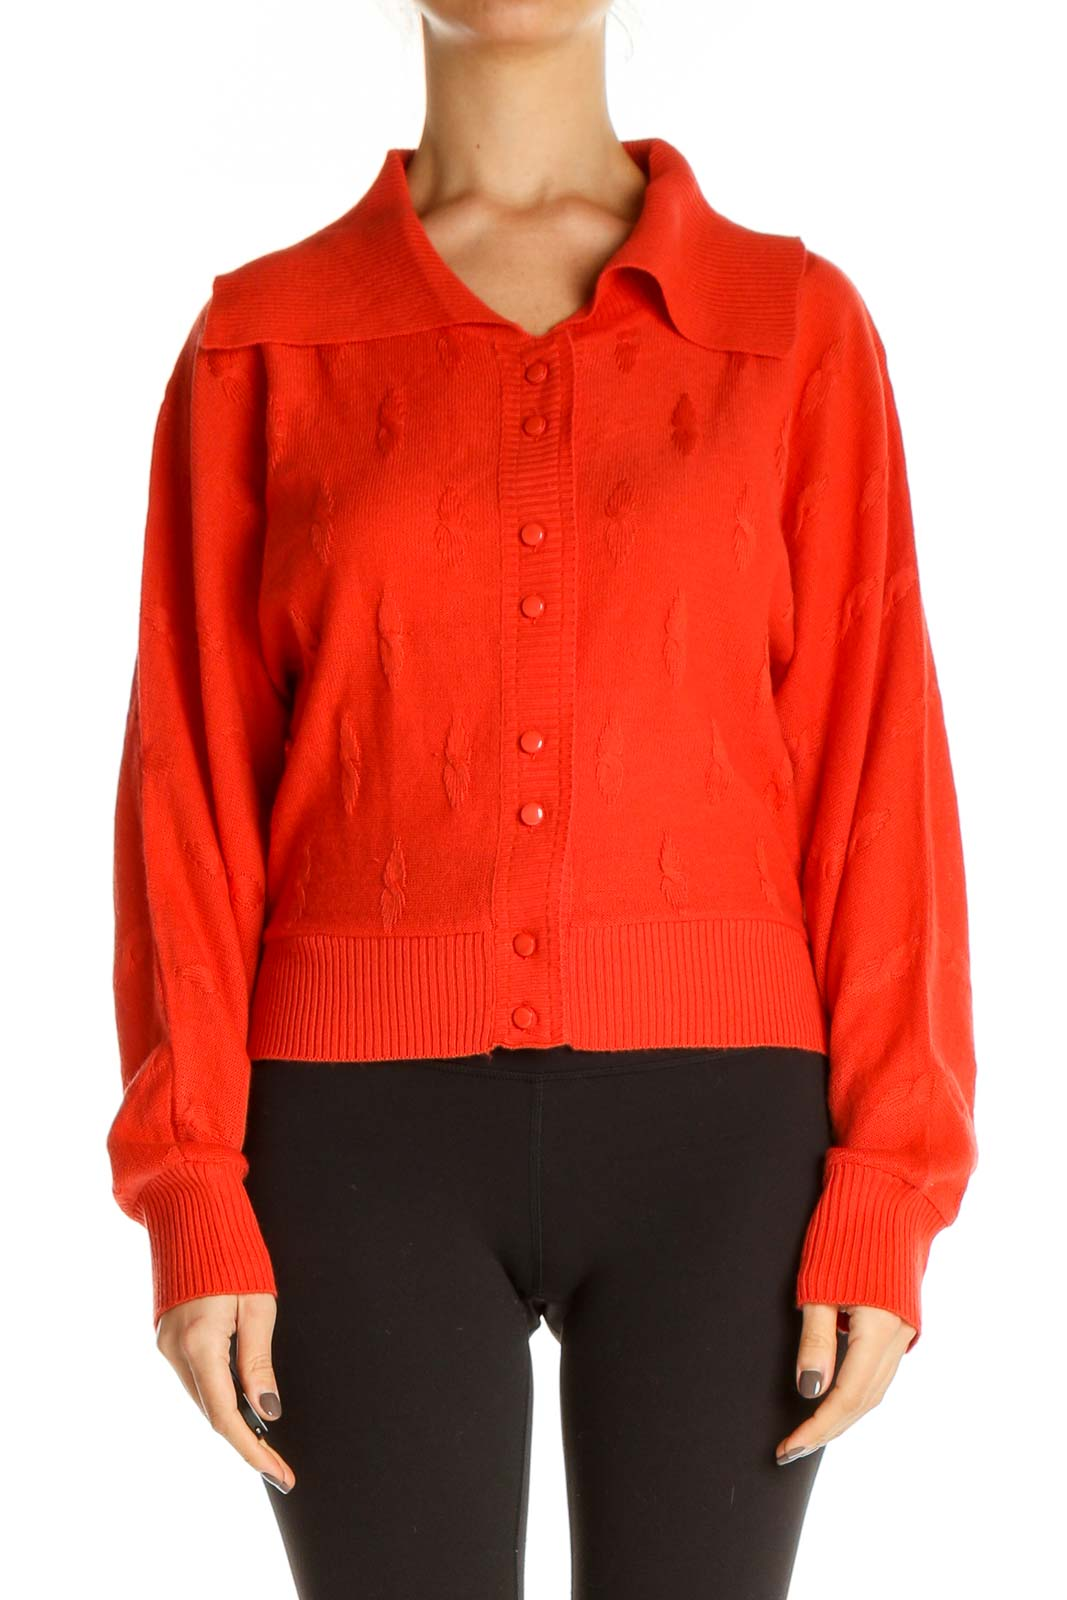 Orange Solid Retro Sweater Front